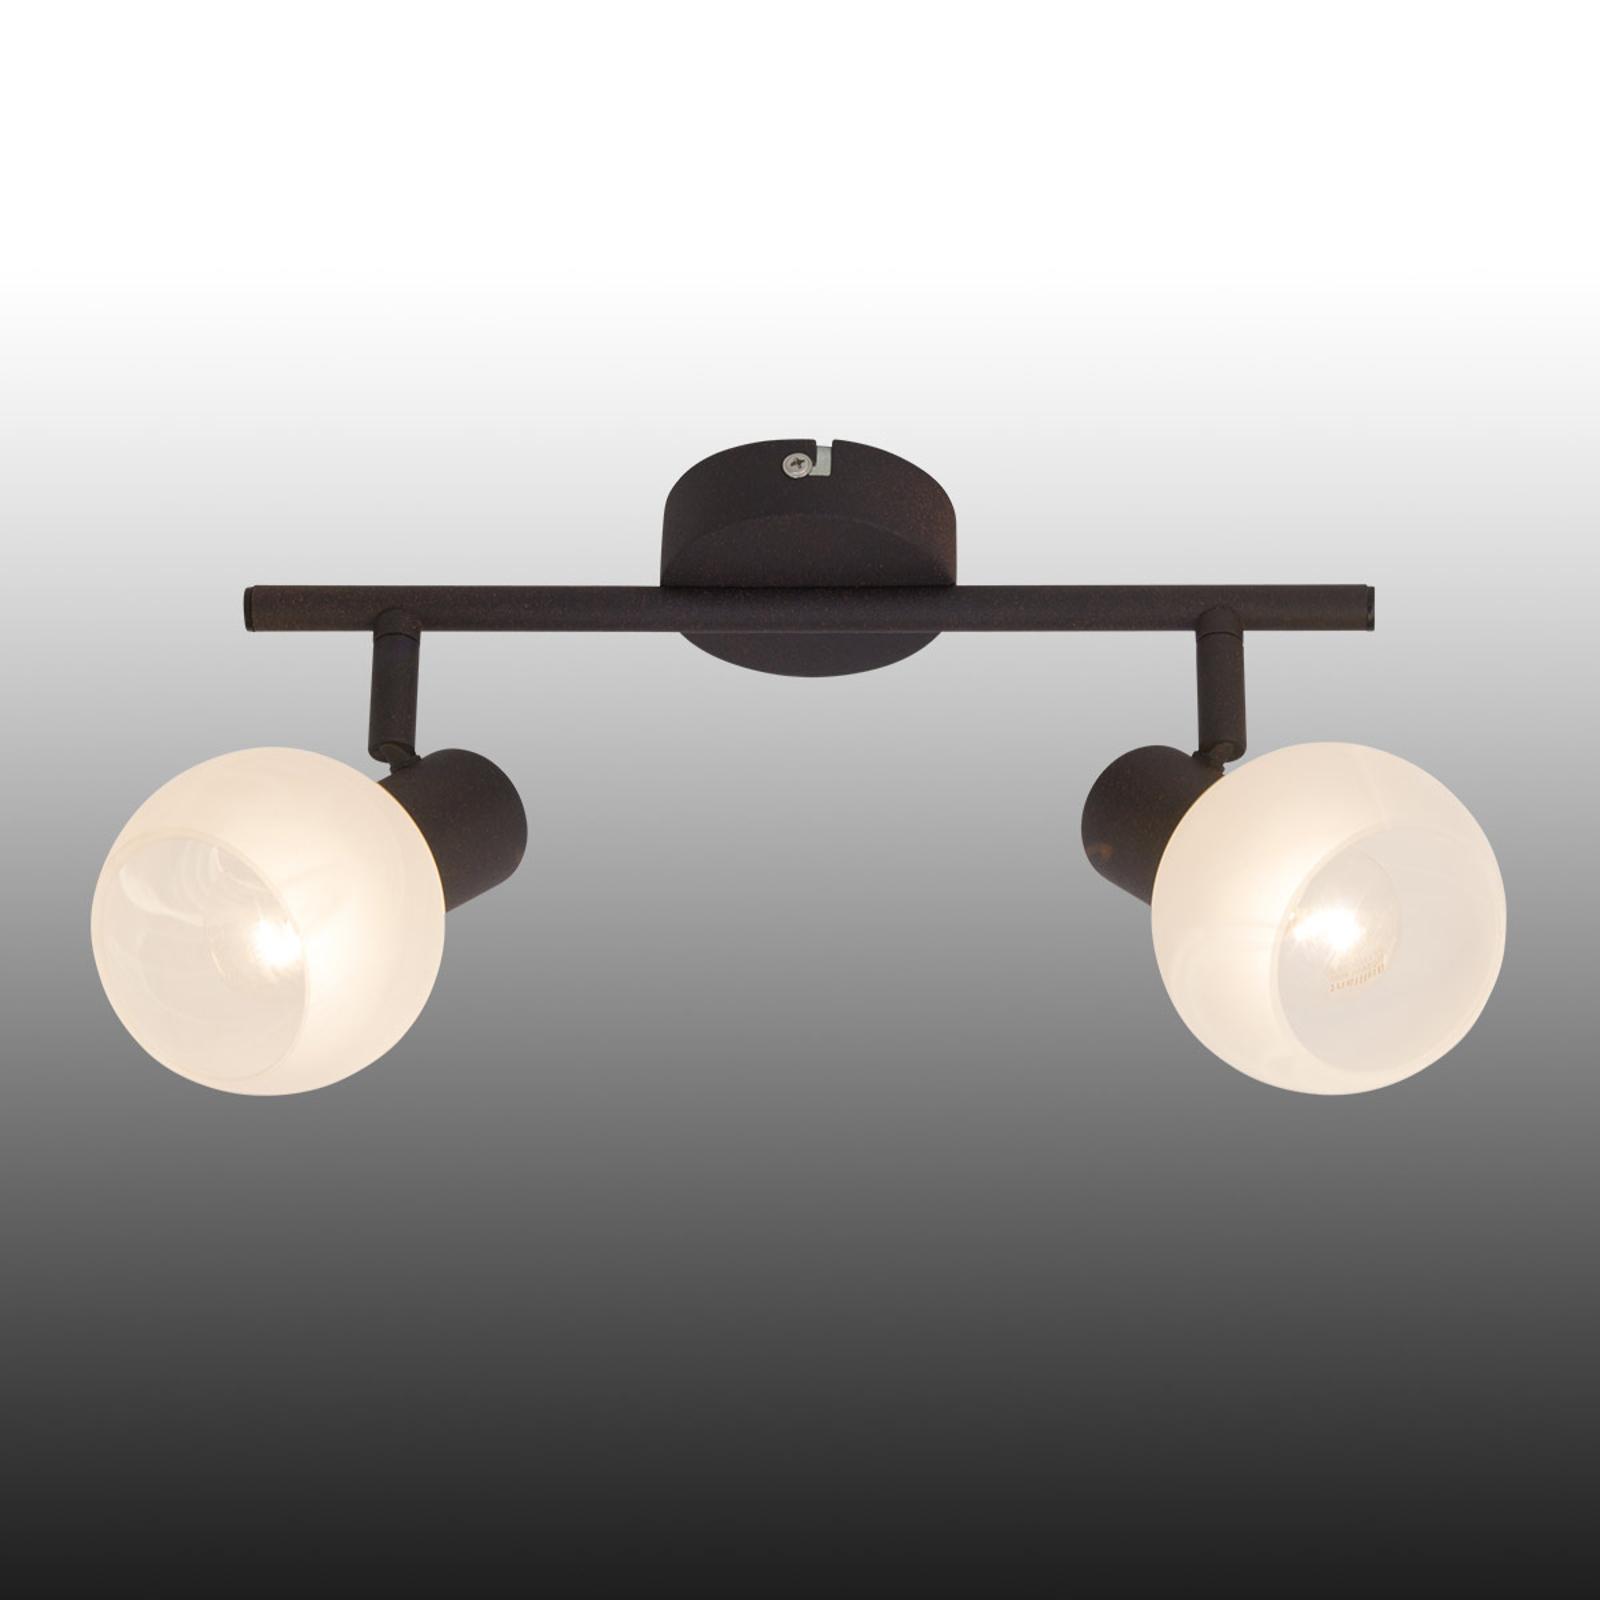 Plafondlamp Gabon in bruin en wit, 2-l.